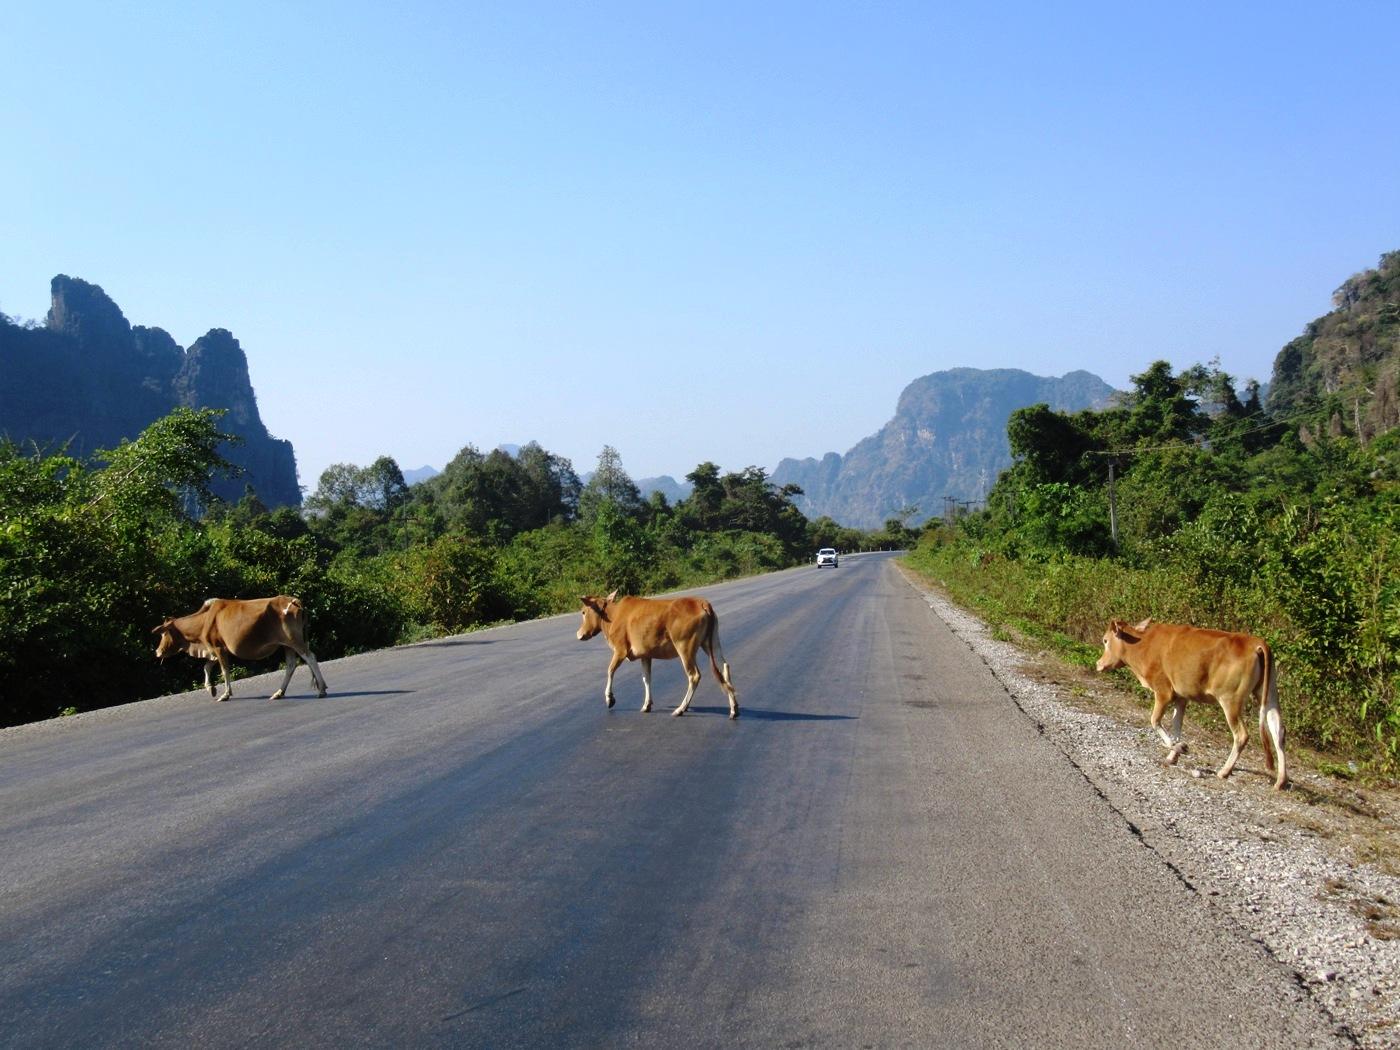 2019-12-laos-thakhek-loop-dia-1-14-carretera